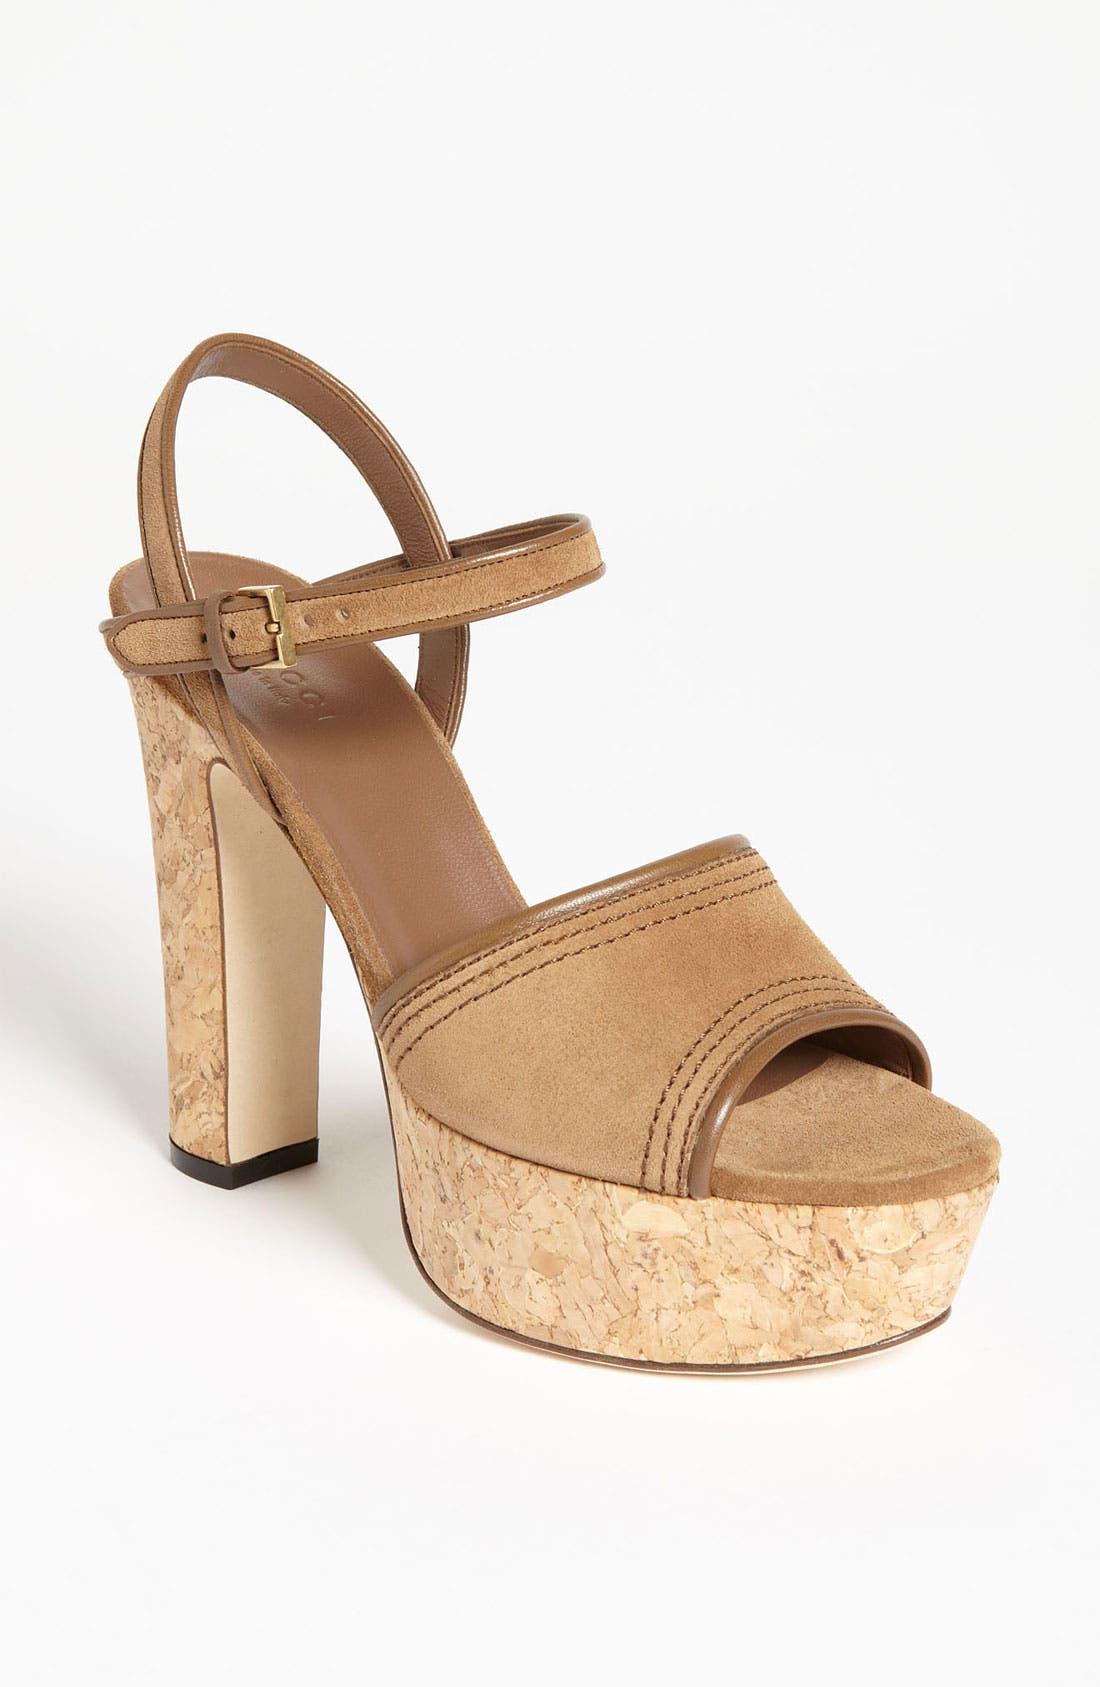 Main Image - Gucci 'Danielle' Platform Sandal